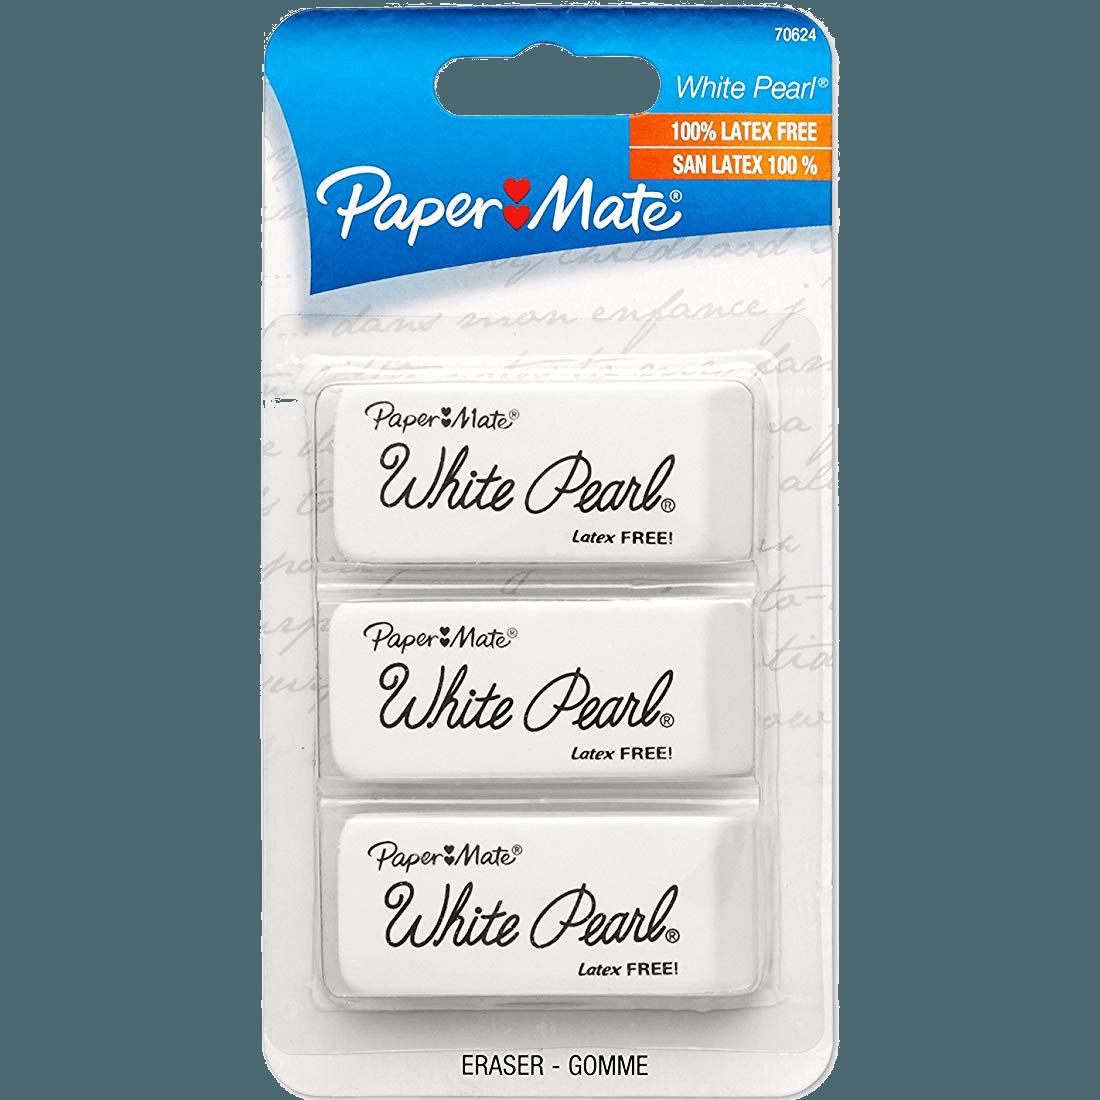 Paper Mate White Pearl